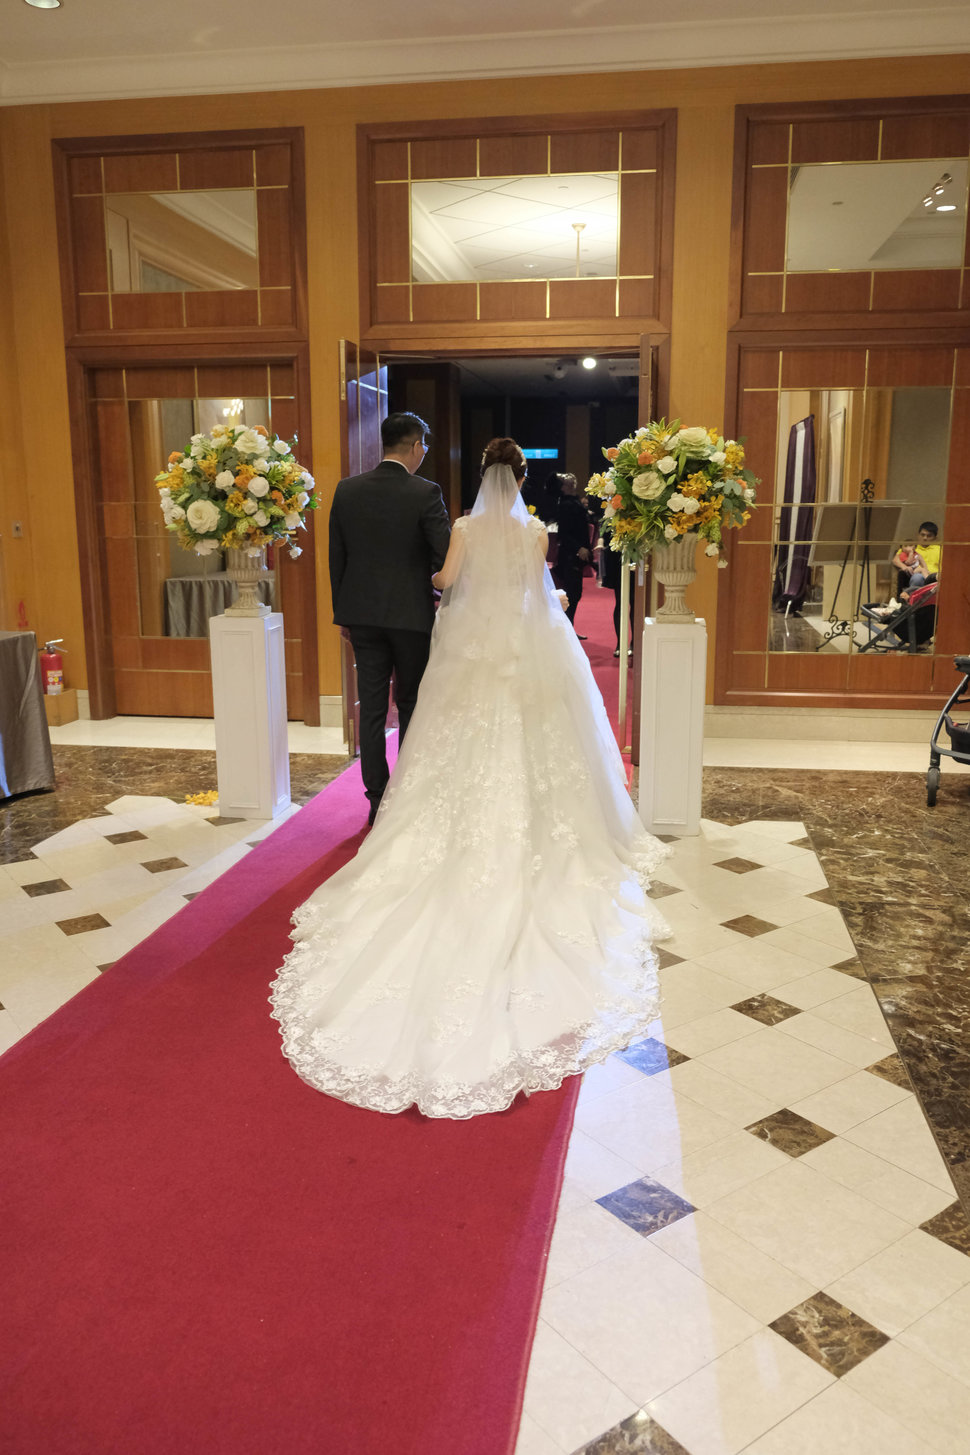 DSCF8159 - 新娘秘書 Yumi陳竹竹 造型工作室 - 結婚吧